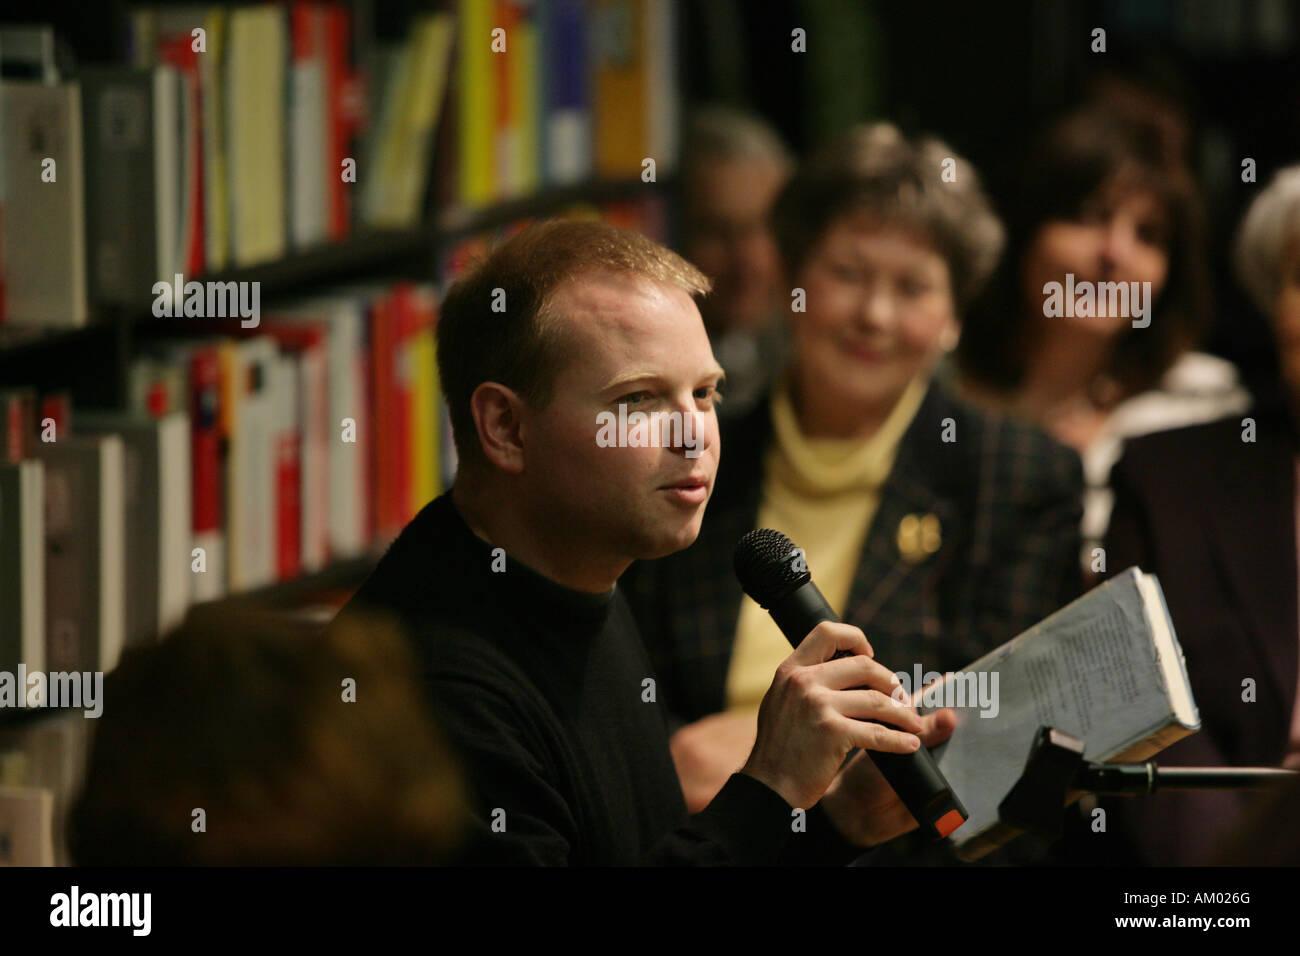 The author Kristof Magnusson Stock Photo